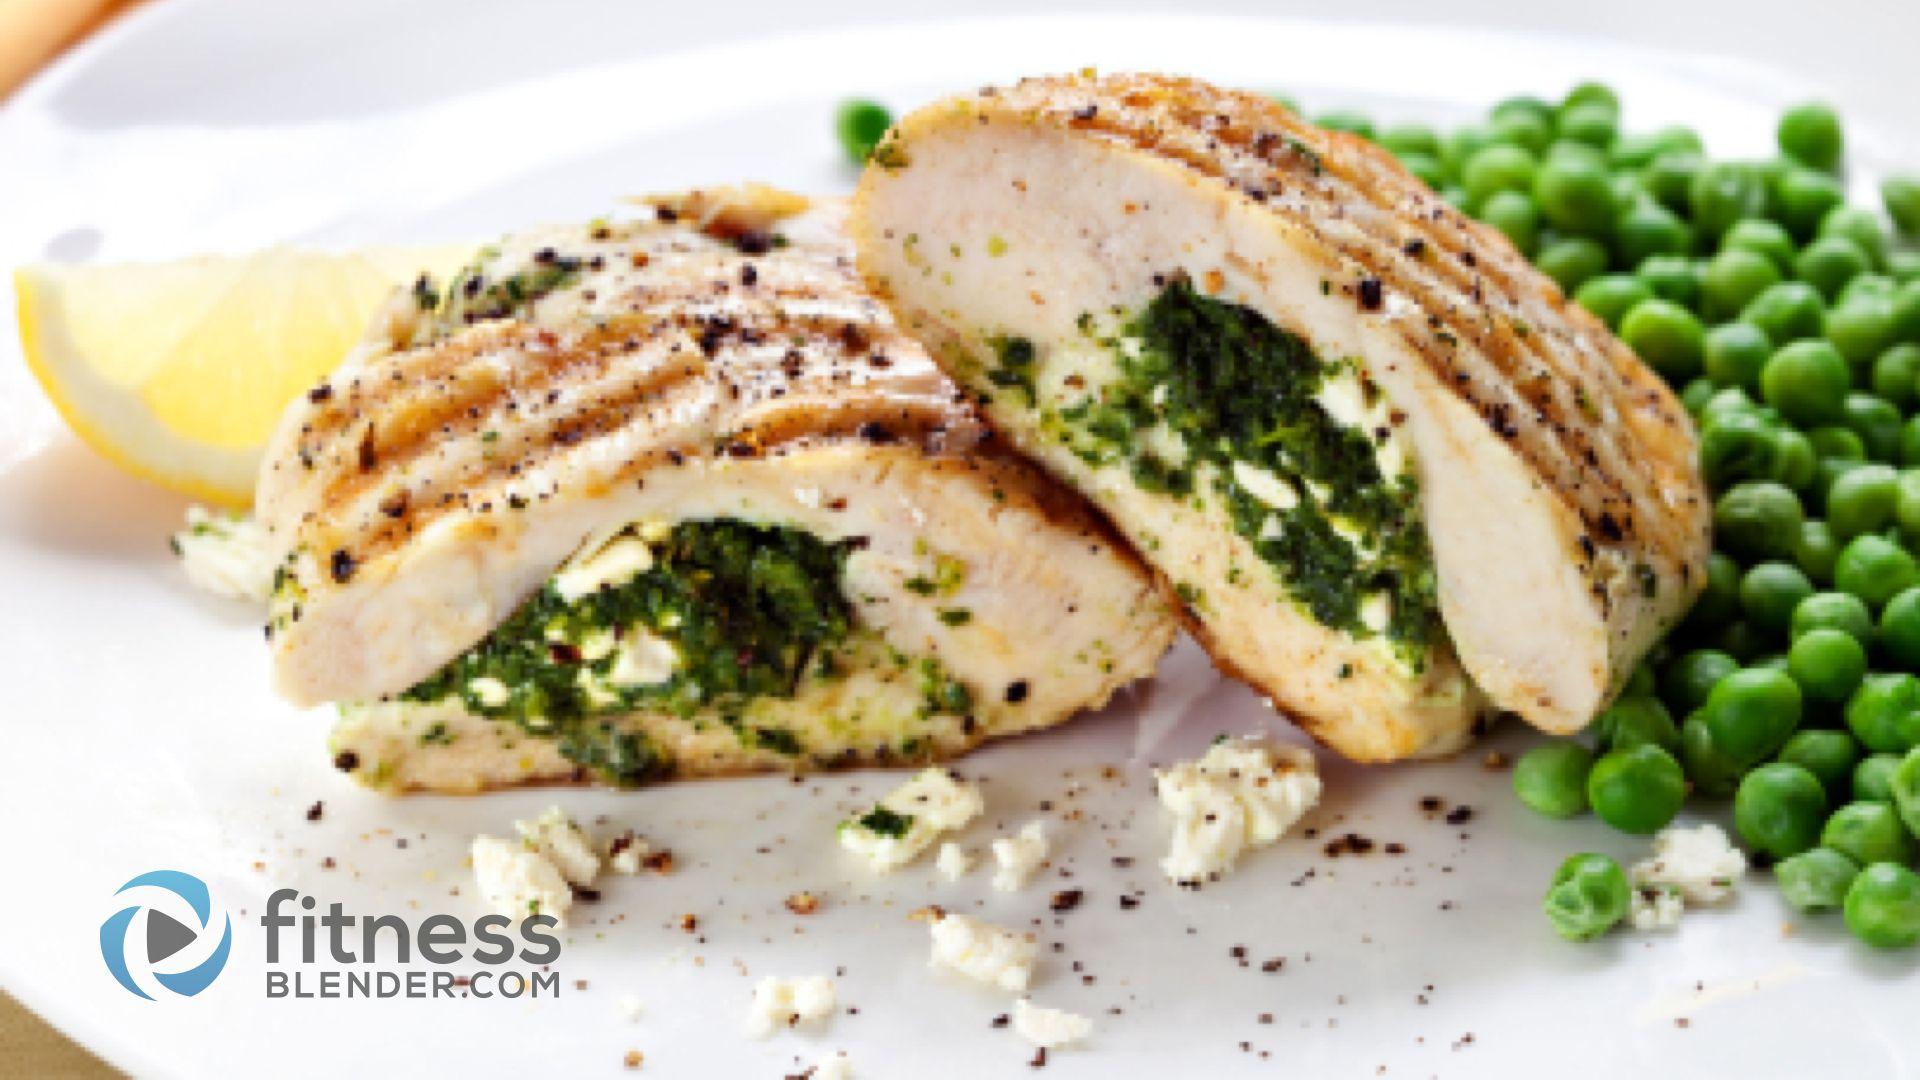 Spinach And Ricotta Stuffed Chicken Healthy Stuffed Chicken Recipe Fitness Blender